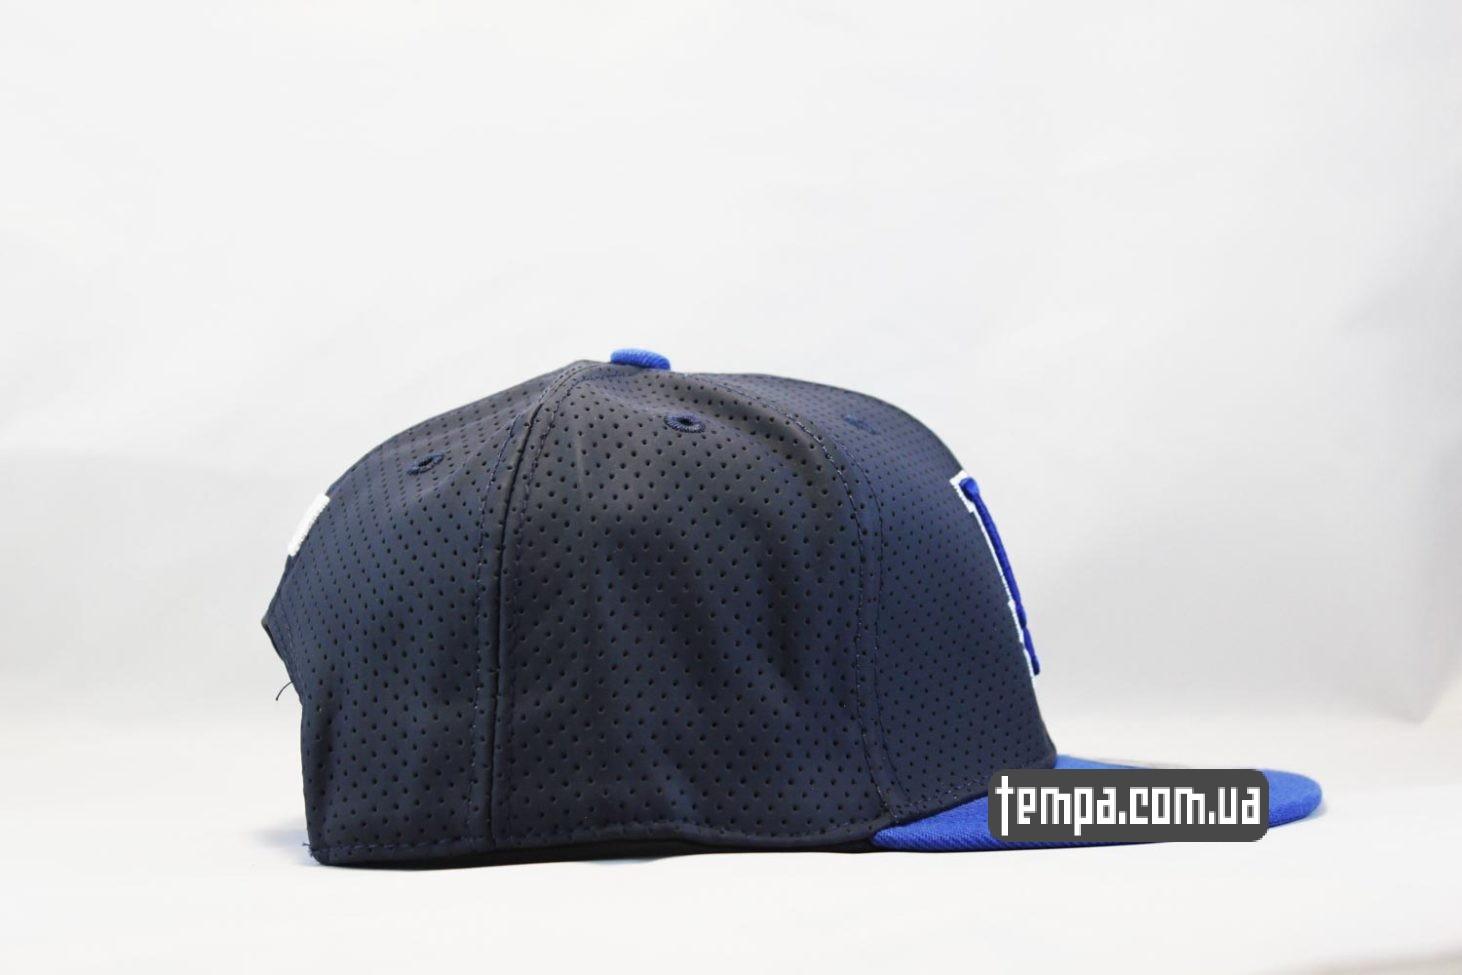 реперская бейсболка сетка кепка snapback trucker LA Los Angeles New Era с сеткой